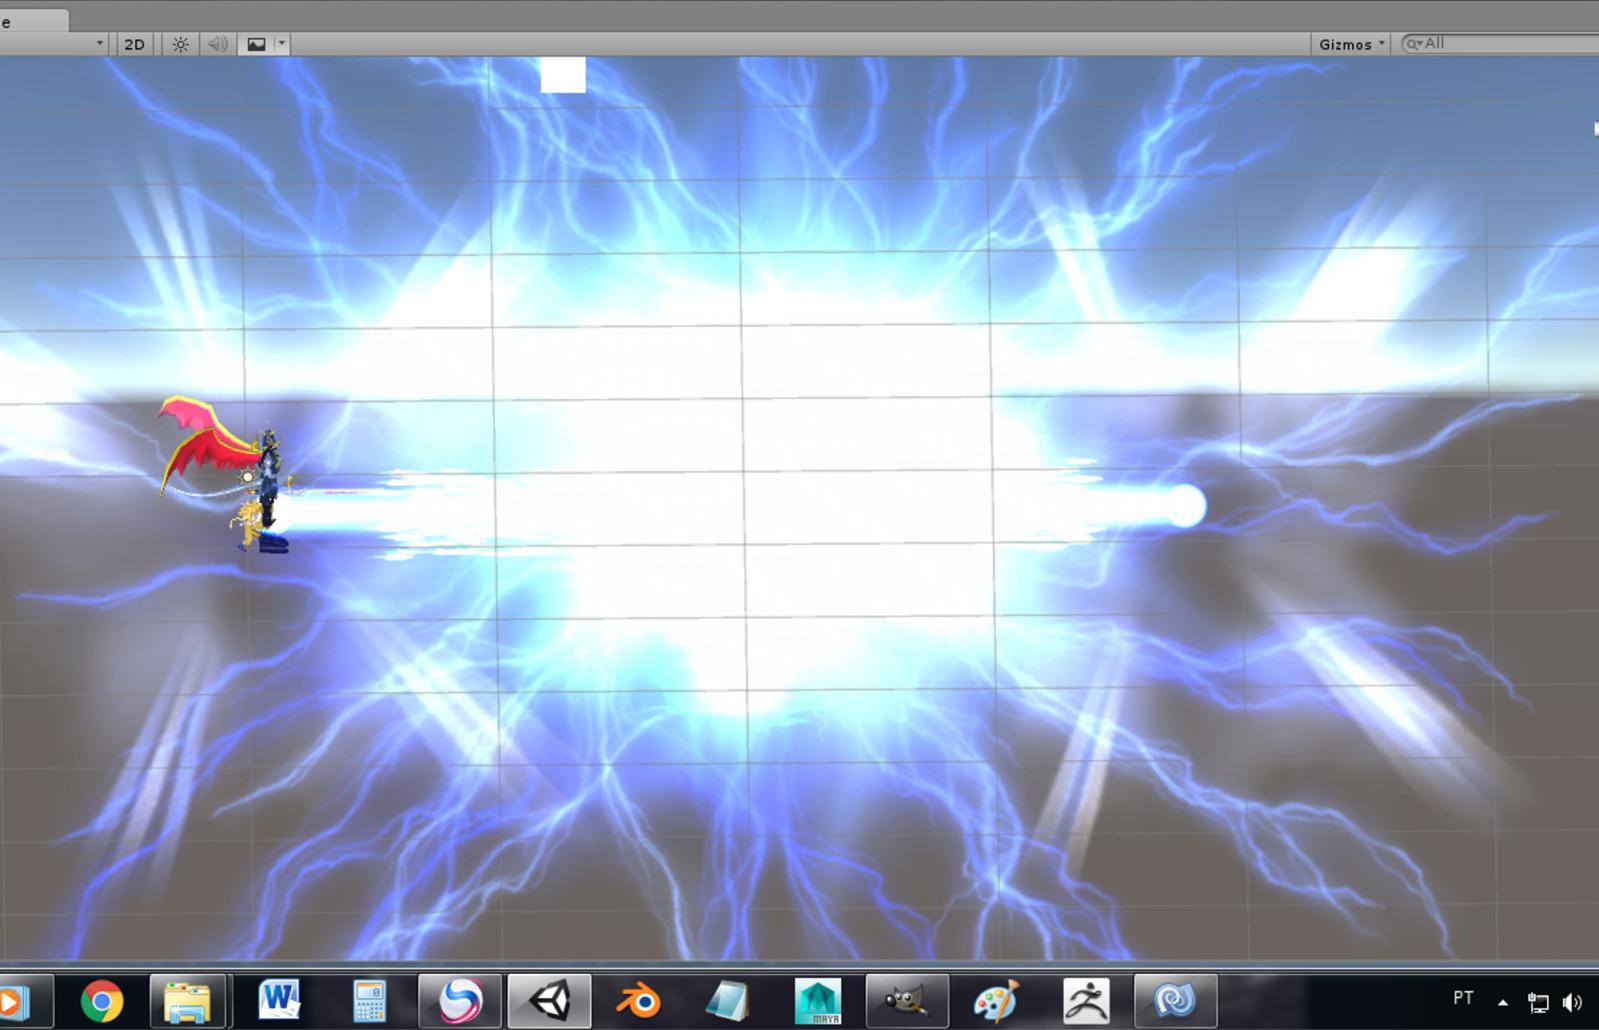 [TUTORIAL] Sistema de colisao de rajadas de energia tipo Dragonball Z 24dem35